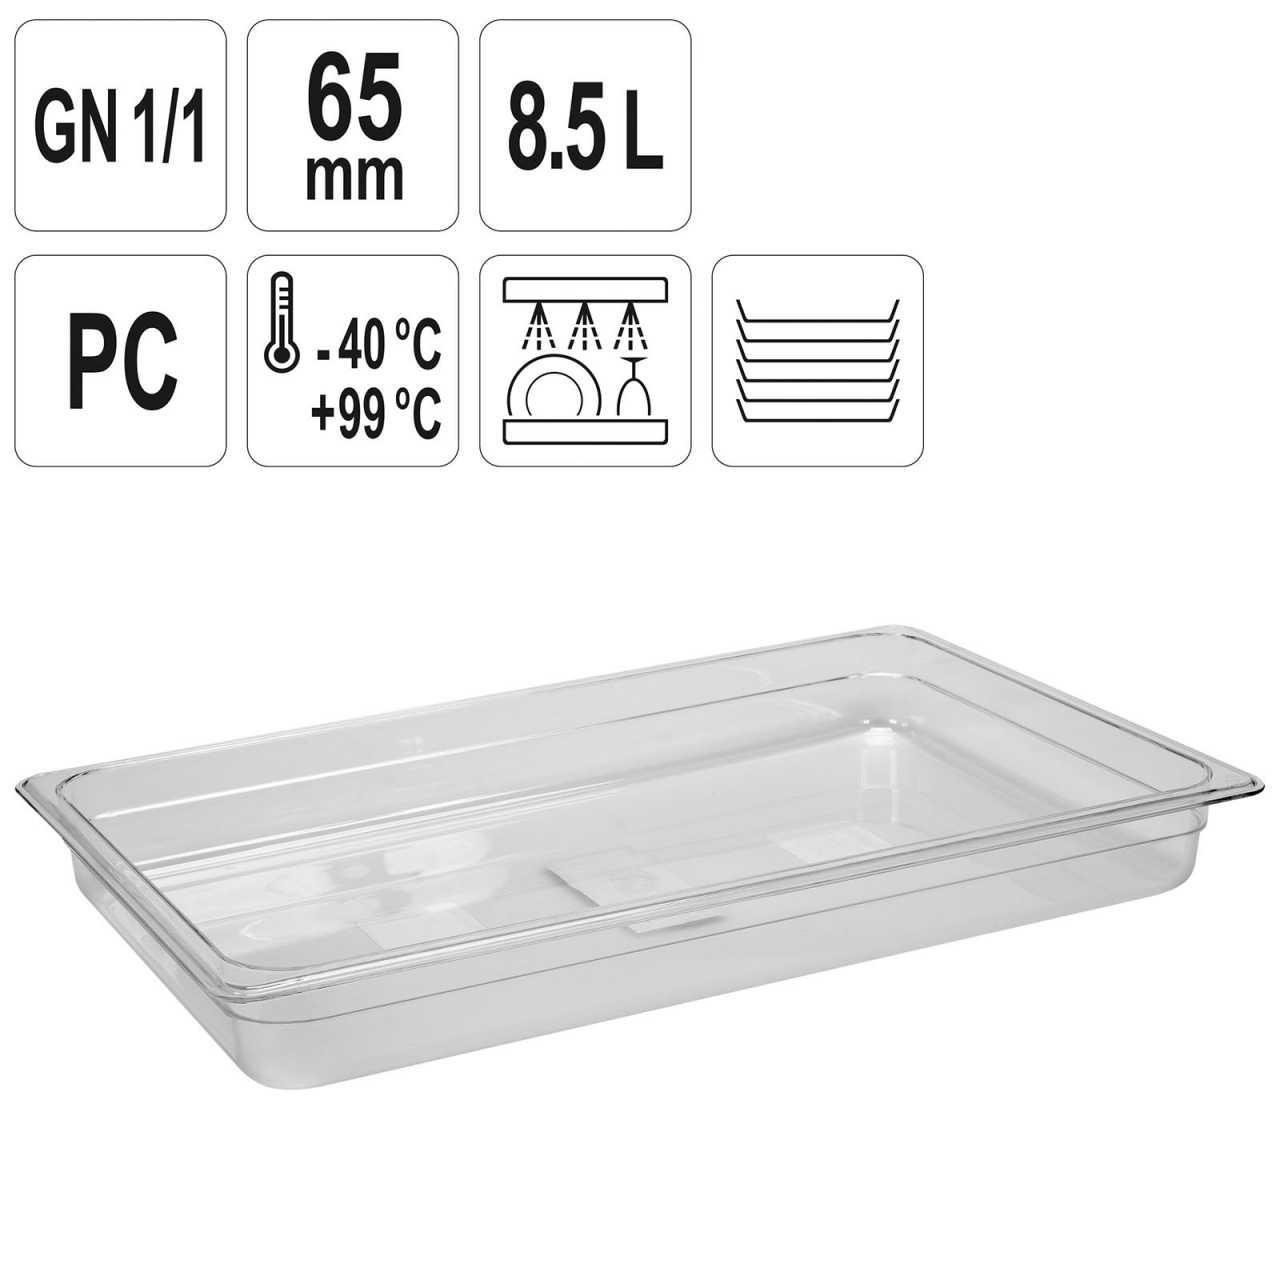 YATO Profi GN Gastronorm Behälter Kunststoff 1/1 65mm